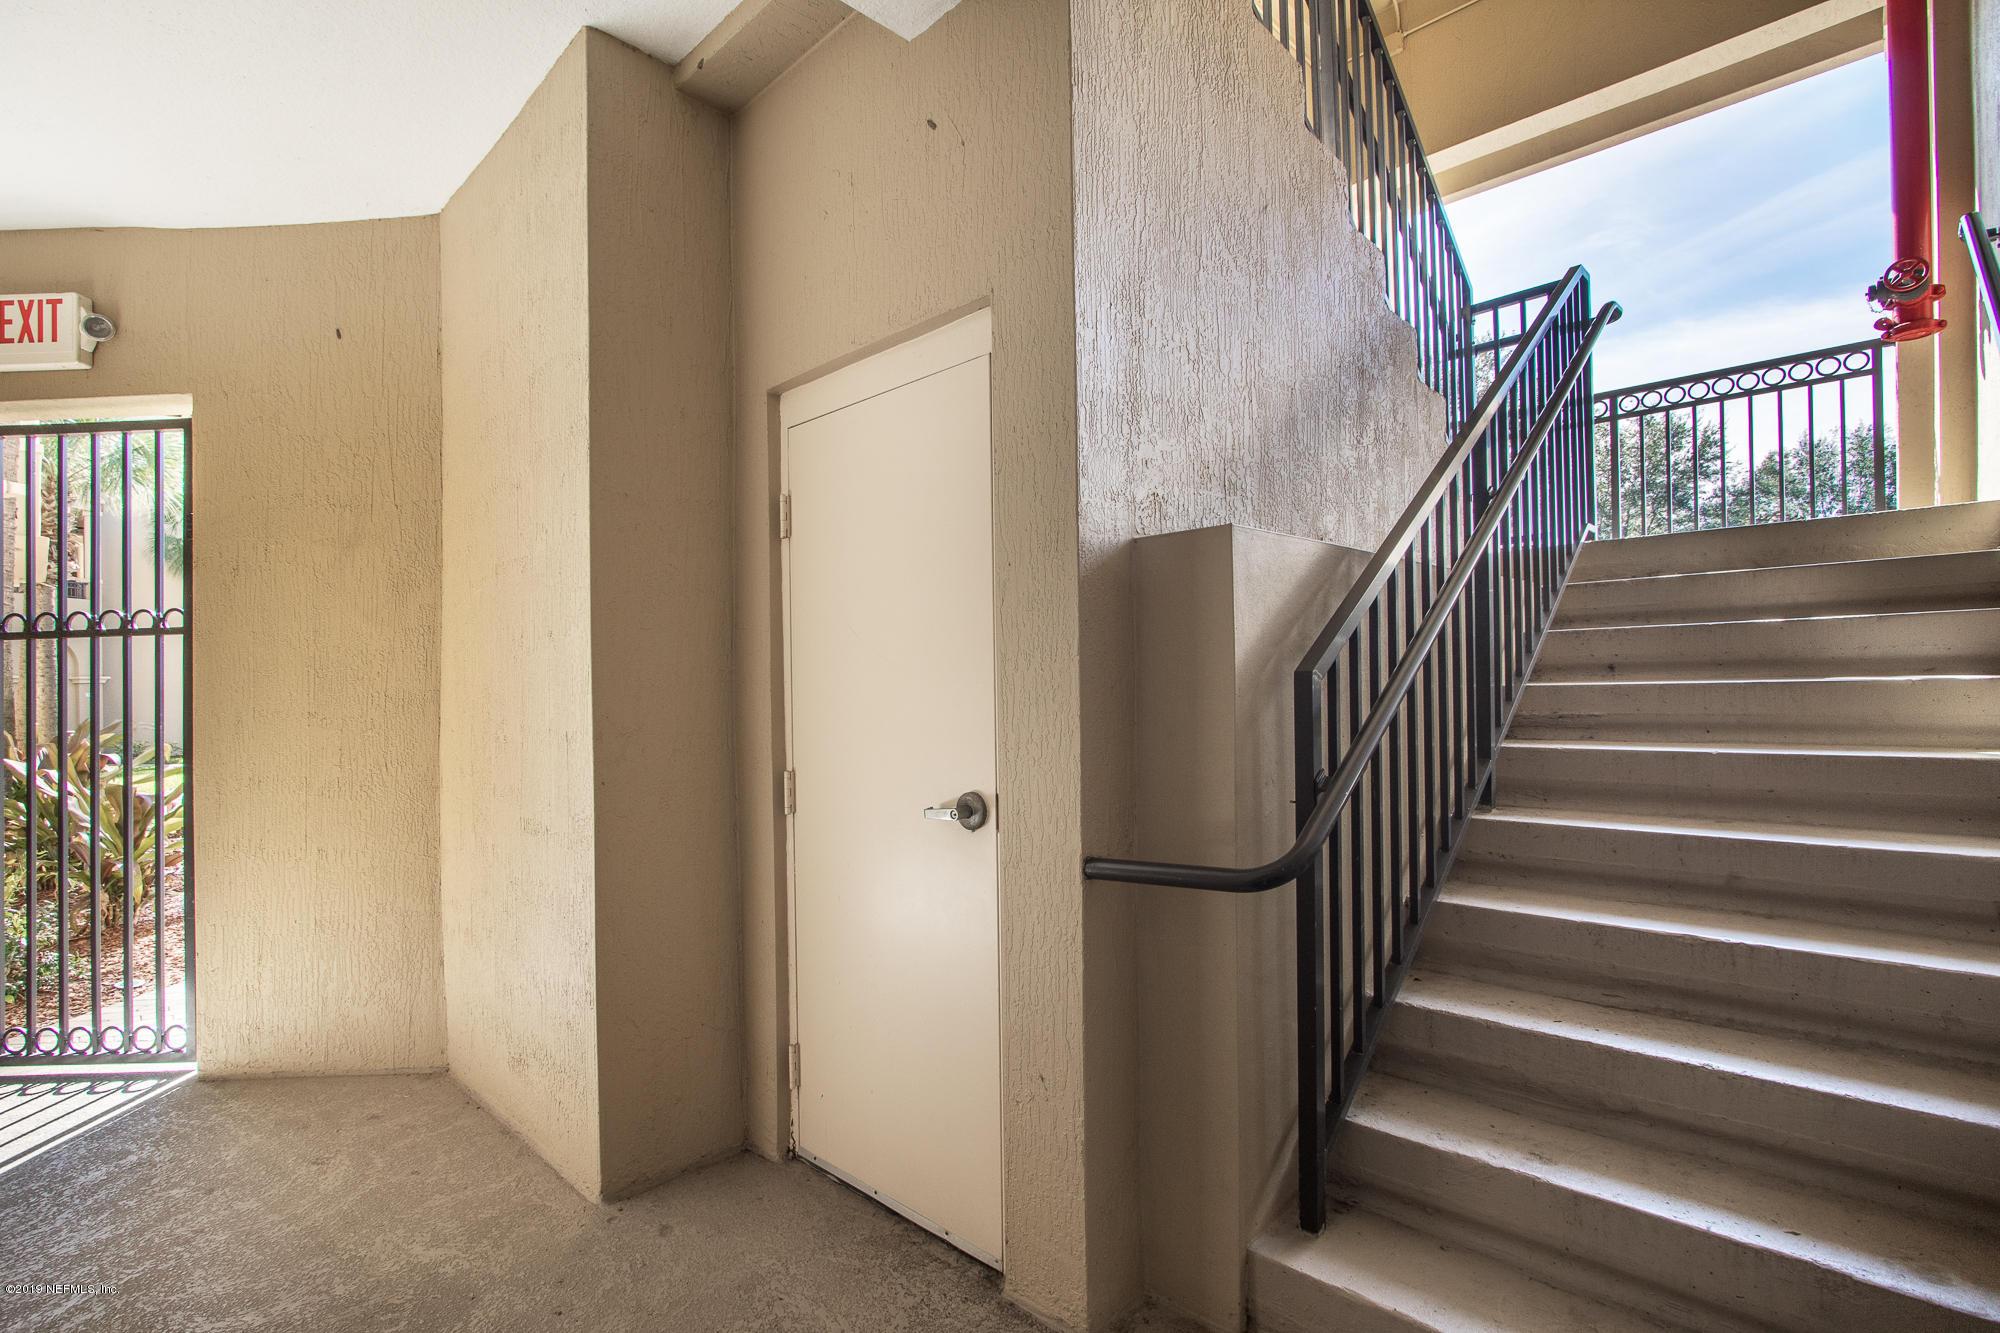 200 PASEO TERRAZA, ST AUGUSTINE, FLORIDA 32095, 3 Bedrooms Bedrooms, ,3 BathroomsBathrooms,Condo,For sale,PASEO TERRAZA,1012045